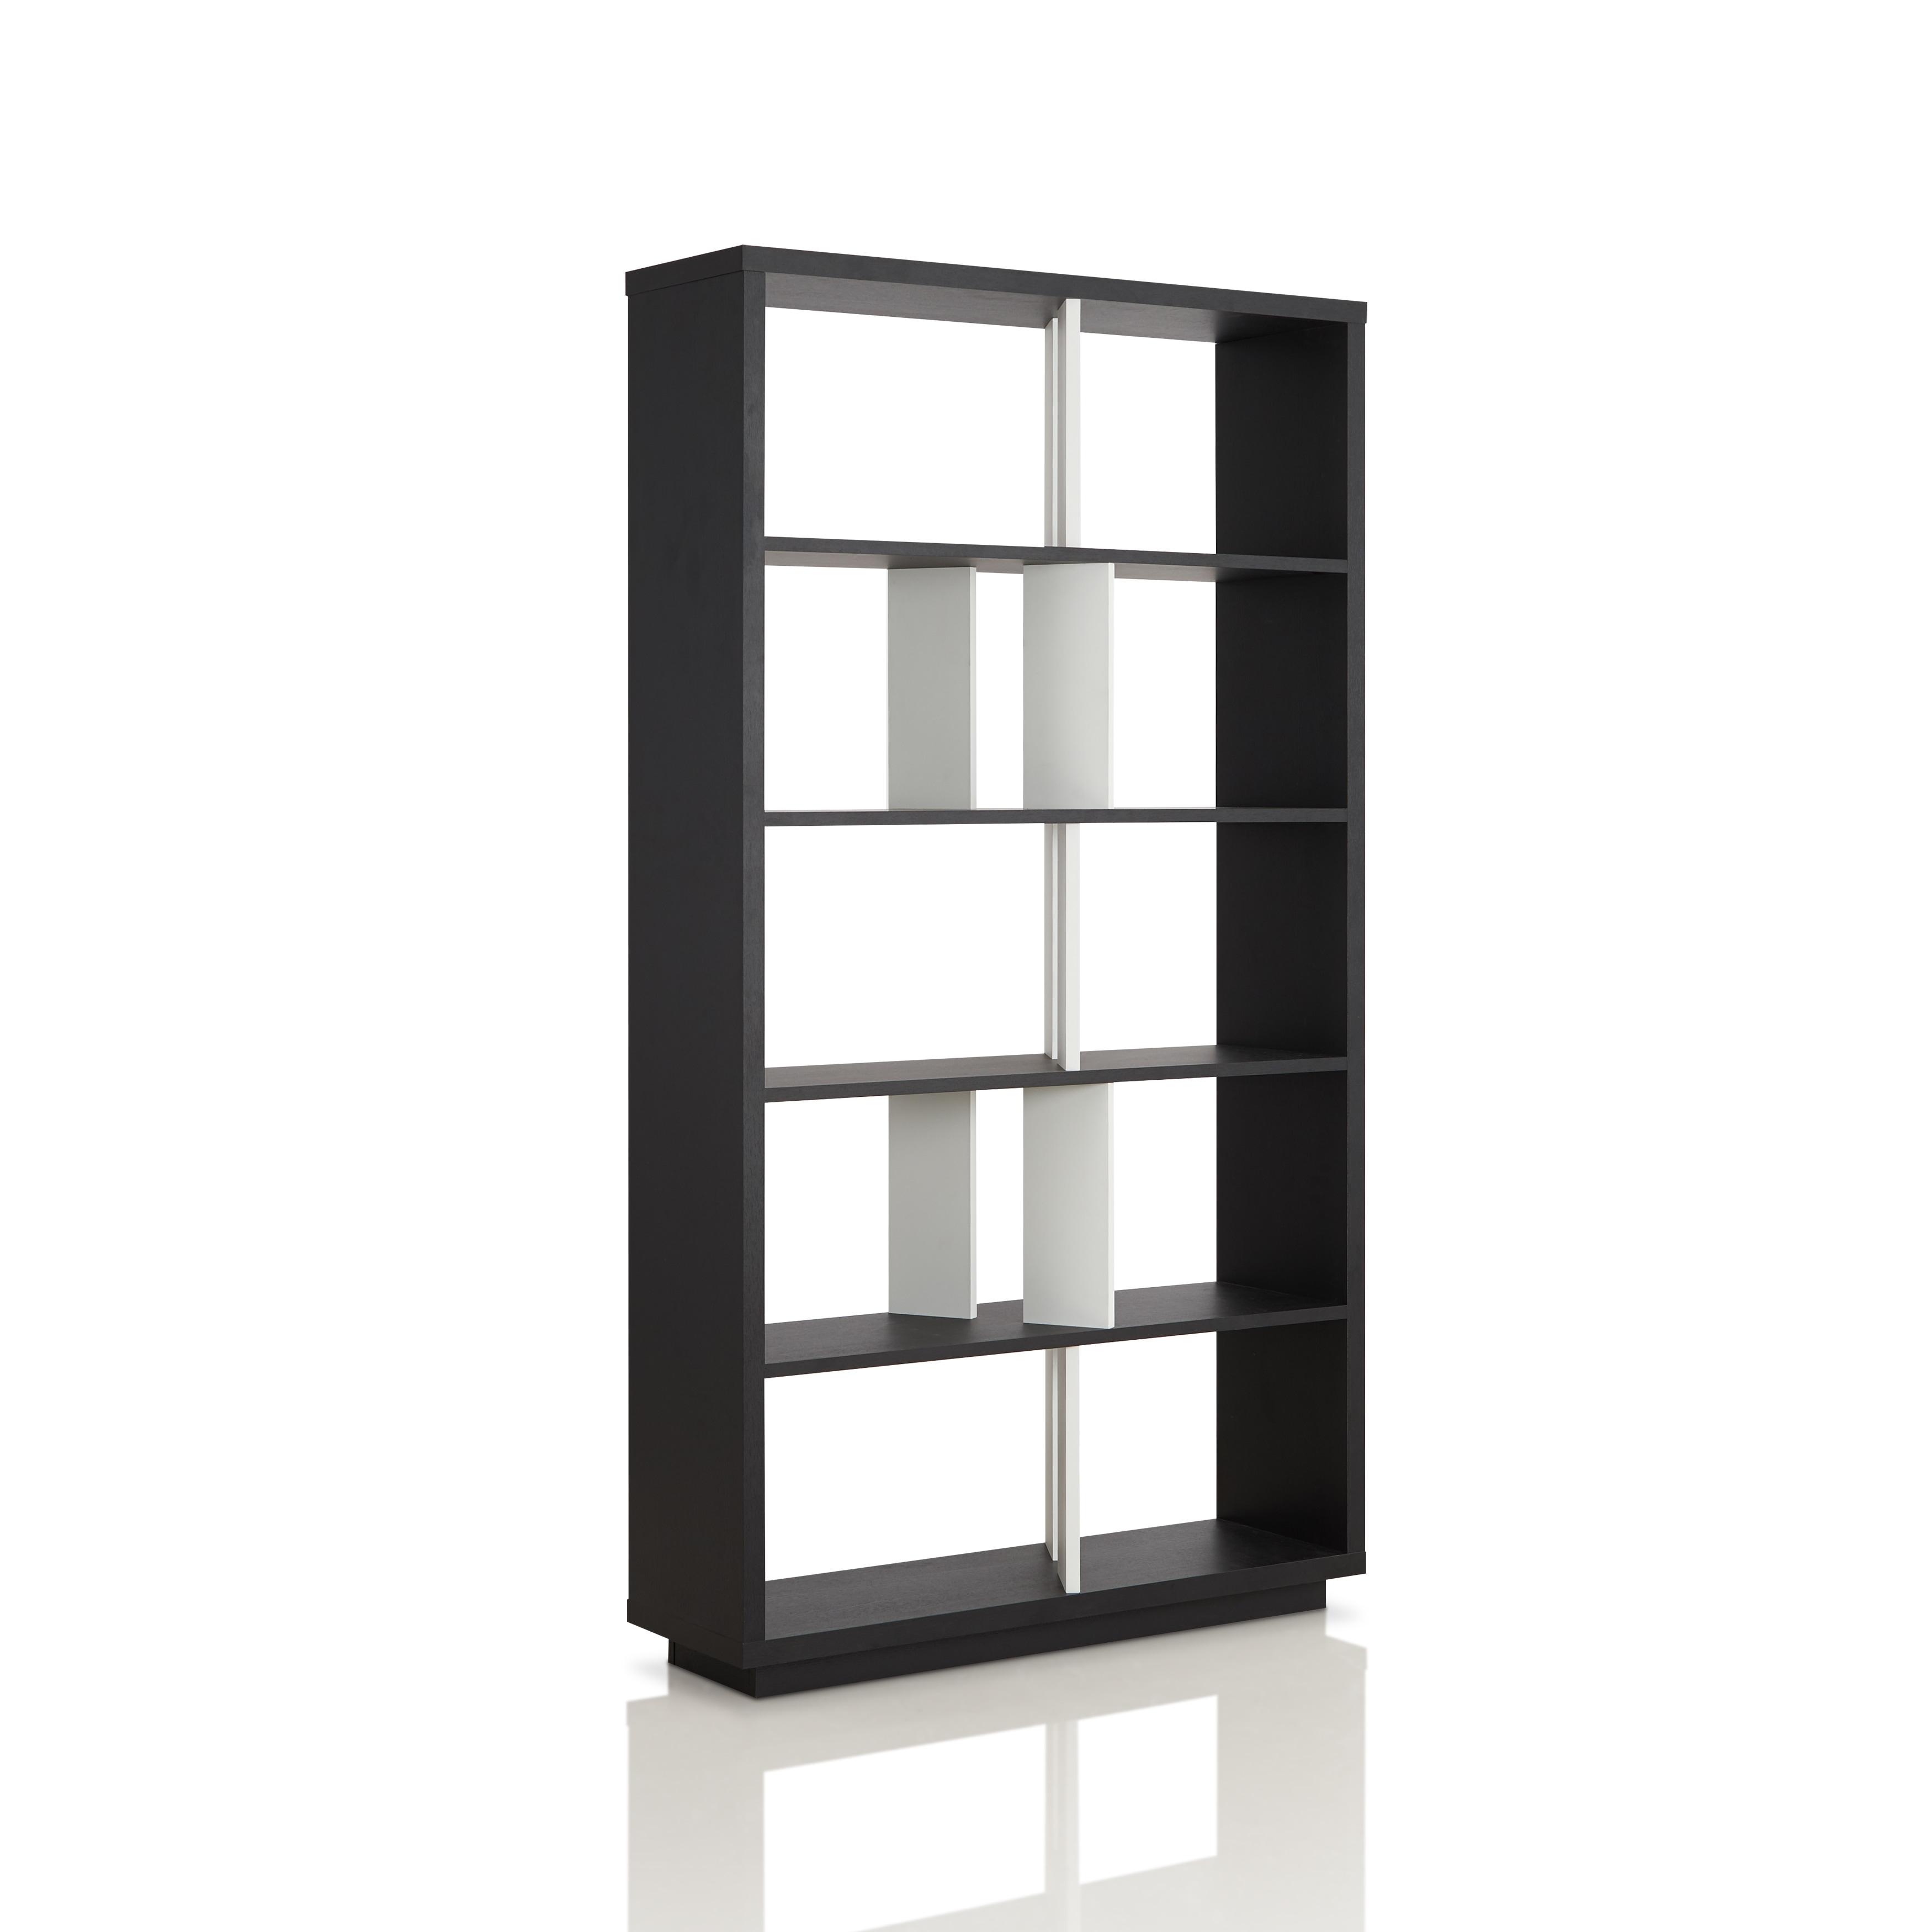 Shop Furniture Of America Balto Modern Black And White Open Bookshelf Room Divider